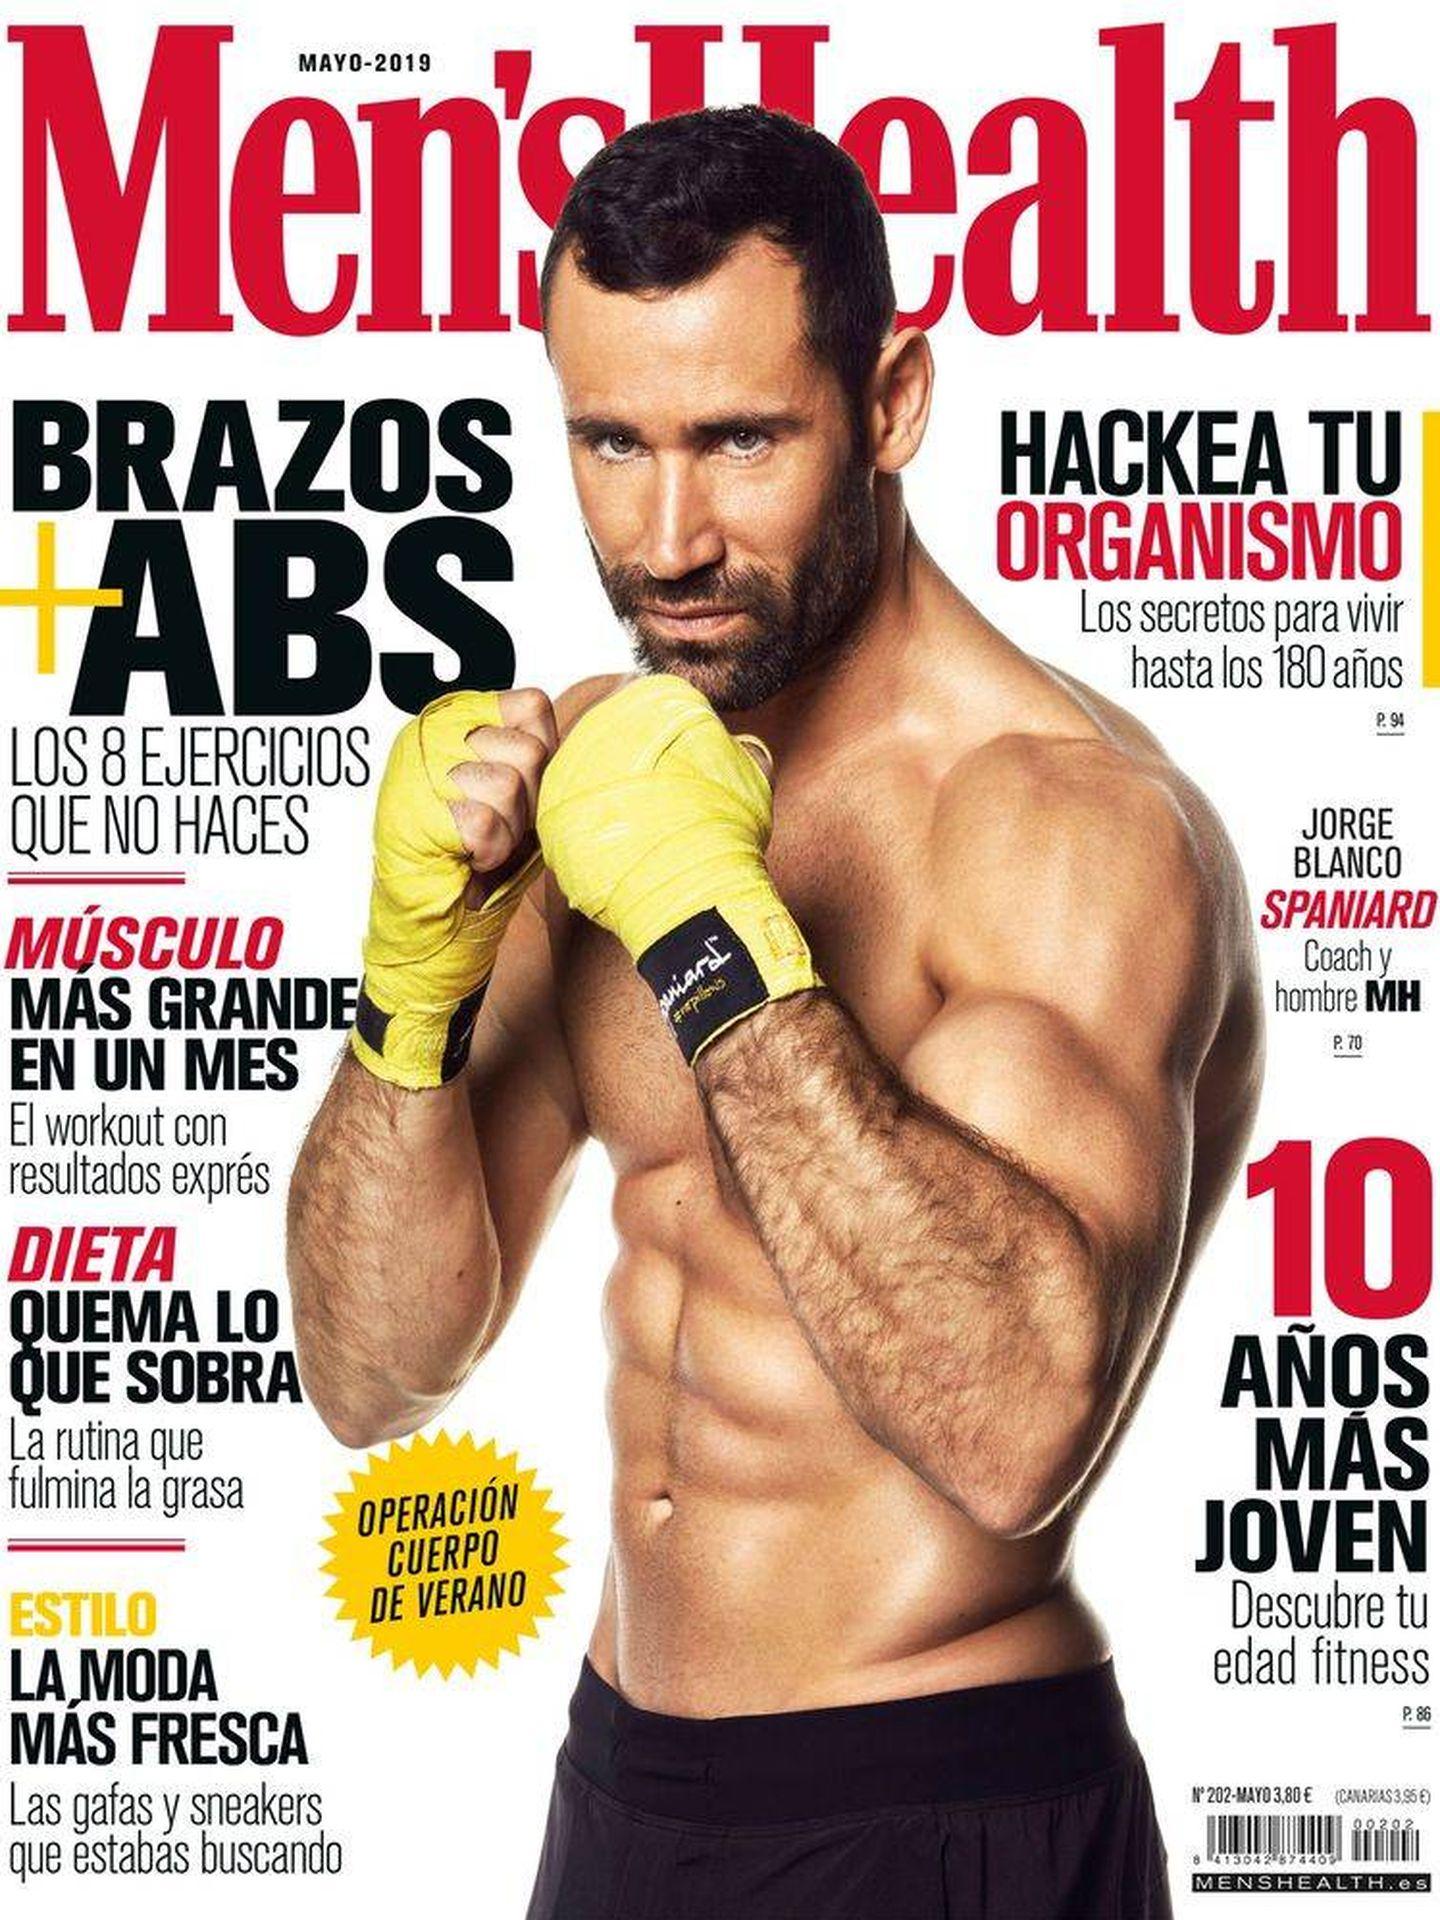 Jorge Blanco, en la portada de 'Men's Health'.